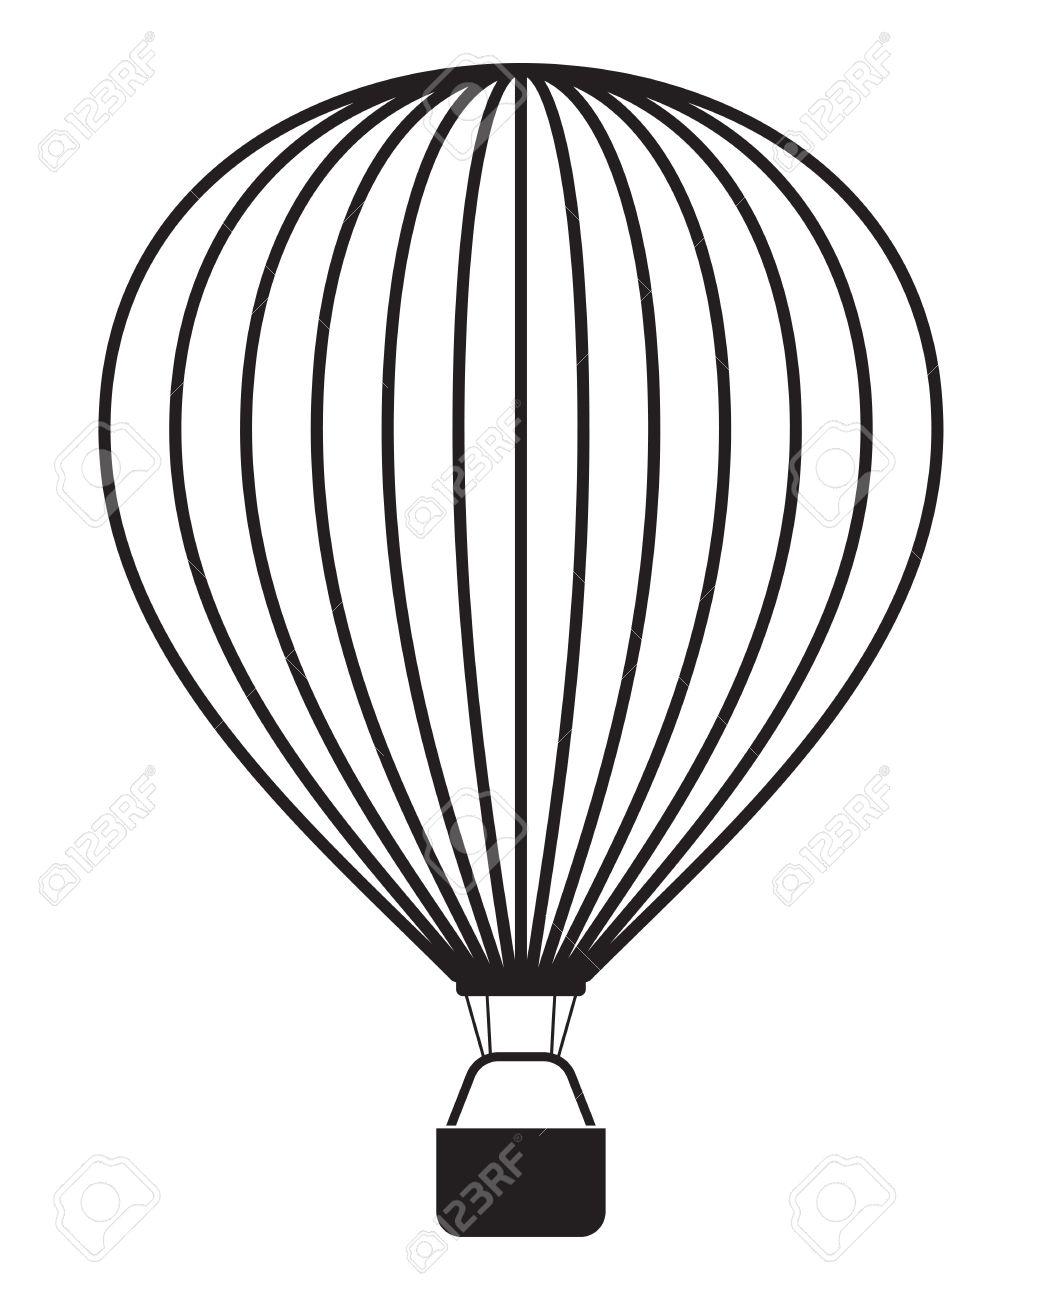 Air Balloon Royalty Free Cliparts, Vectors, And Stock Illustration ...